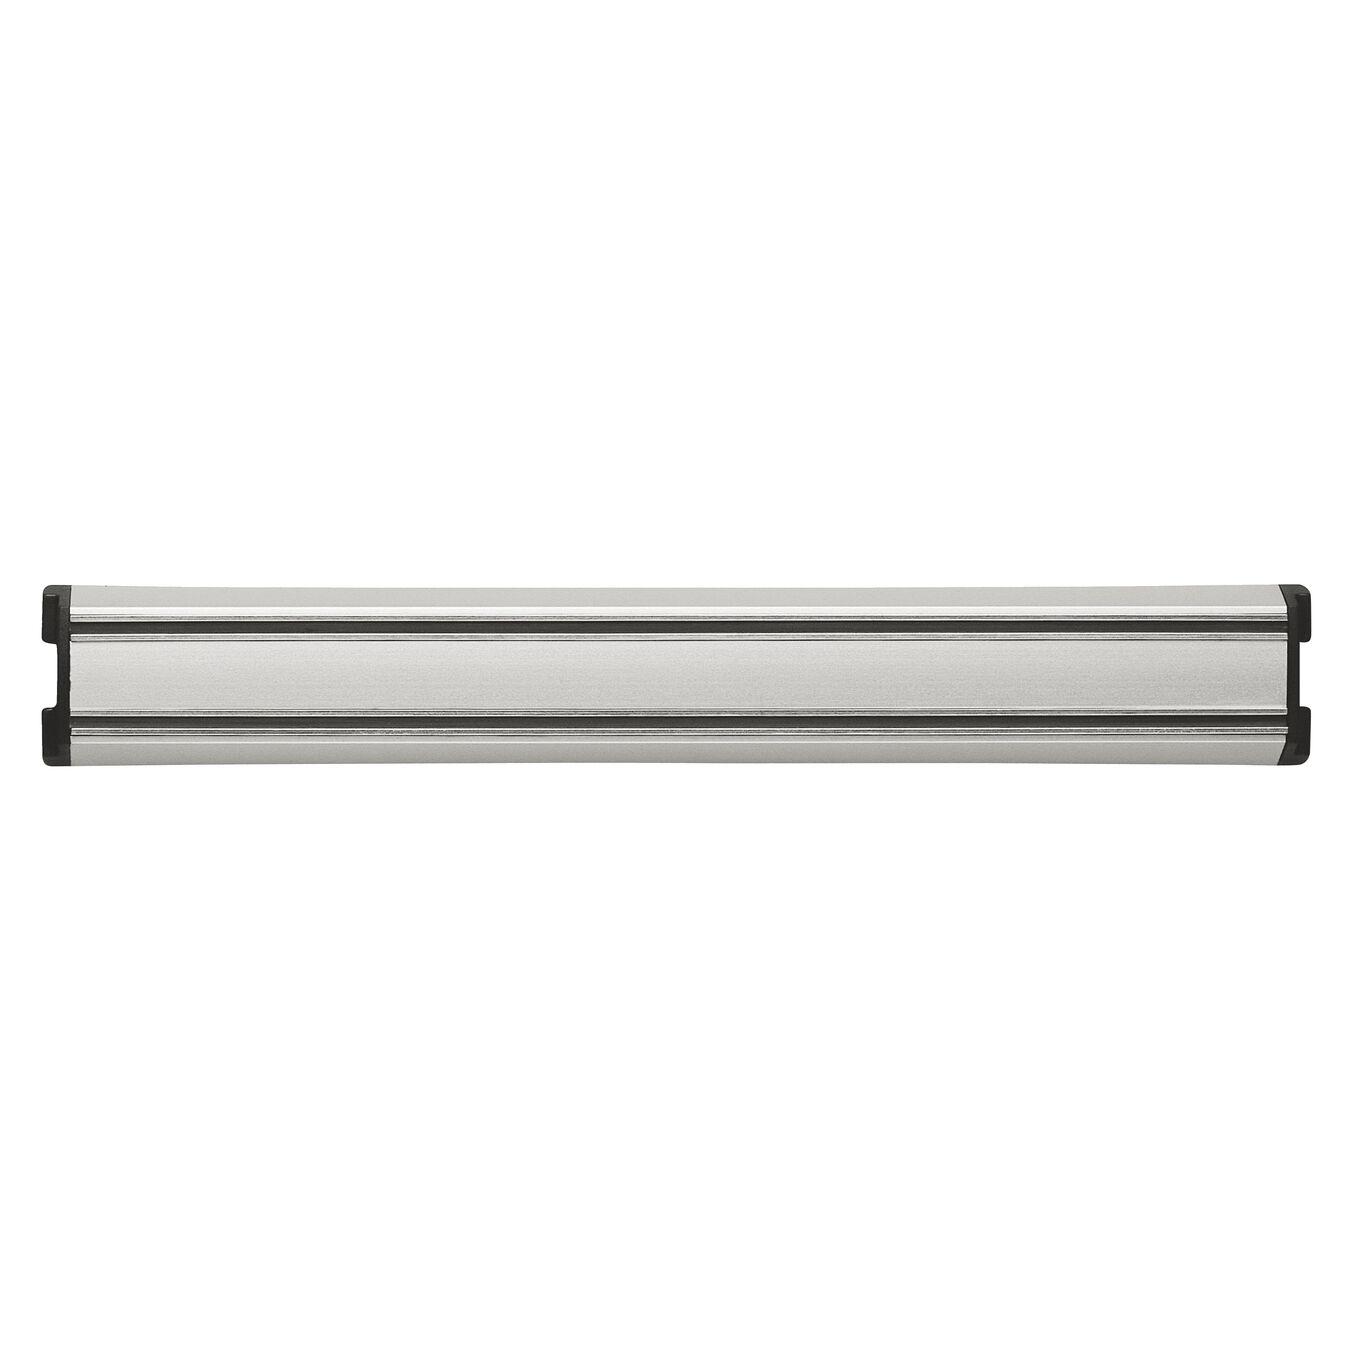 12-inch, Aluminium, Magnetic knife bar, silver,,large 1